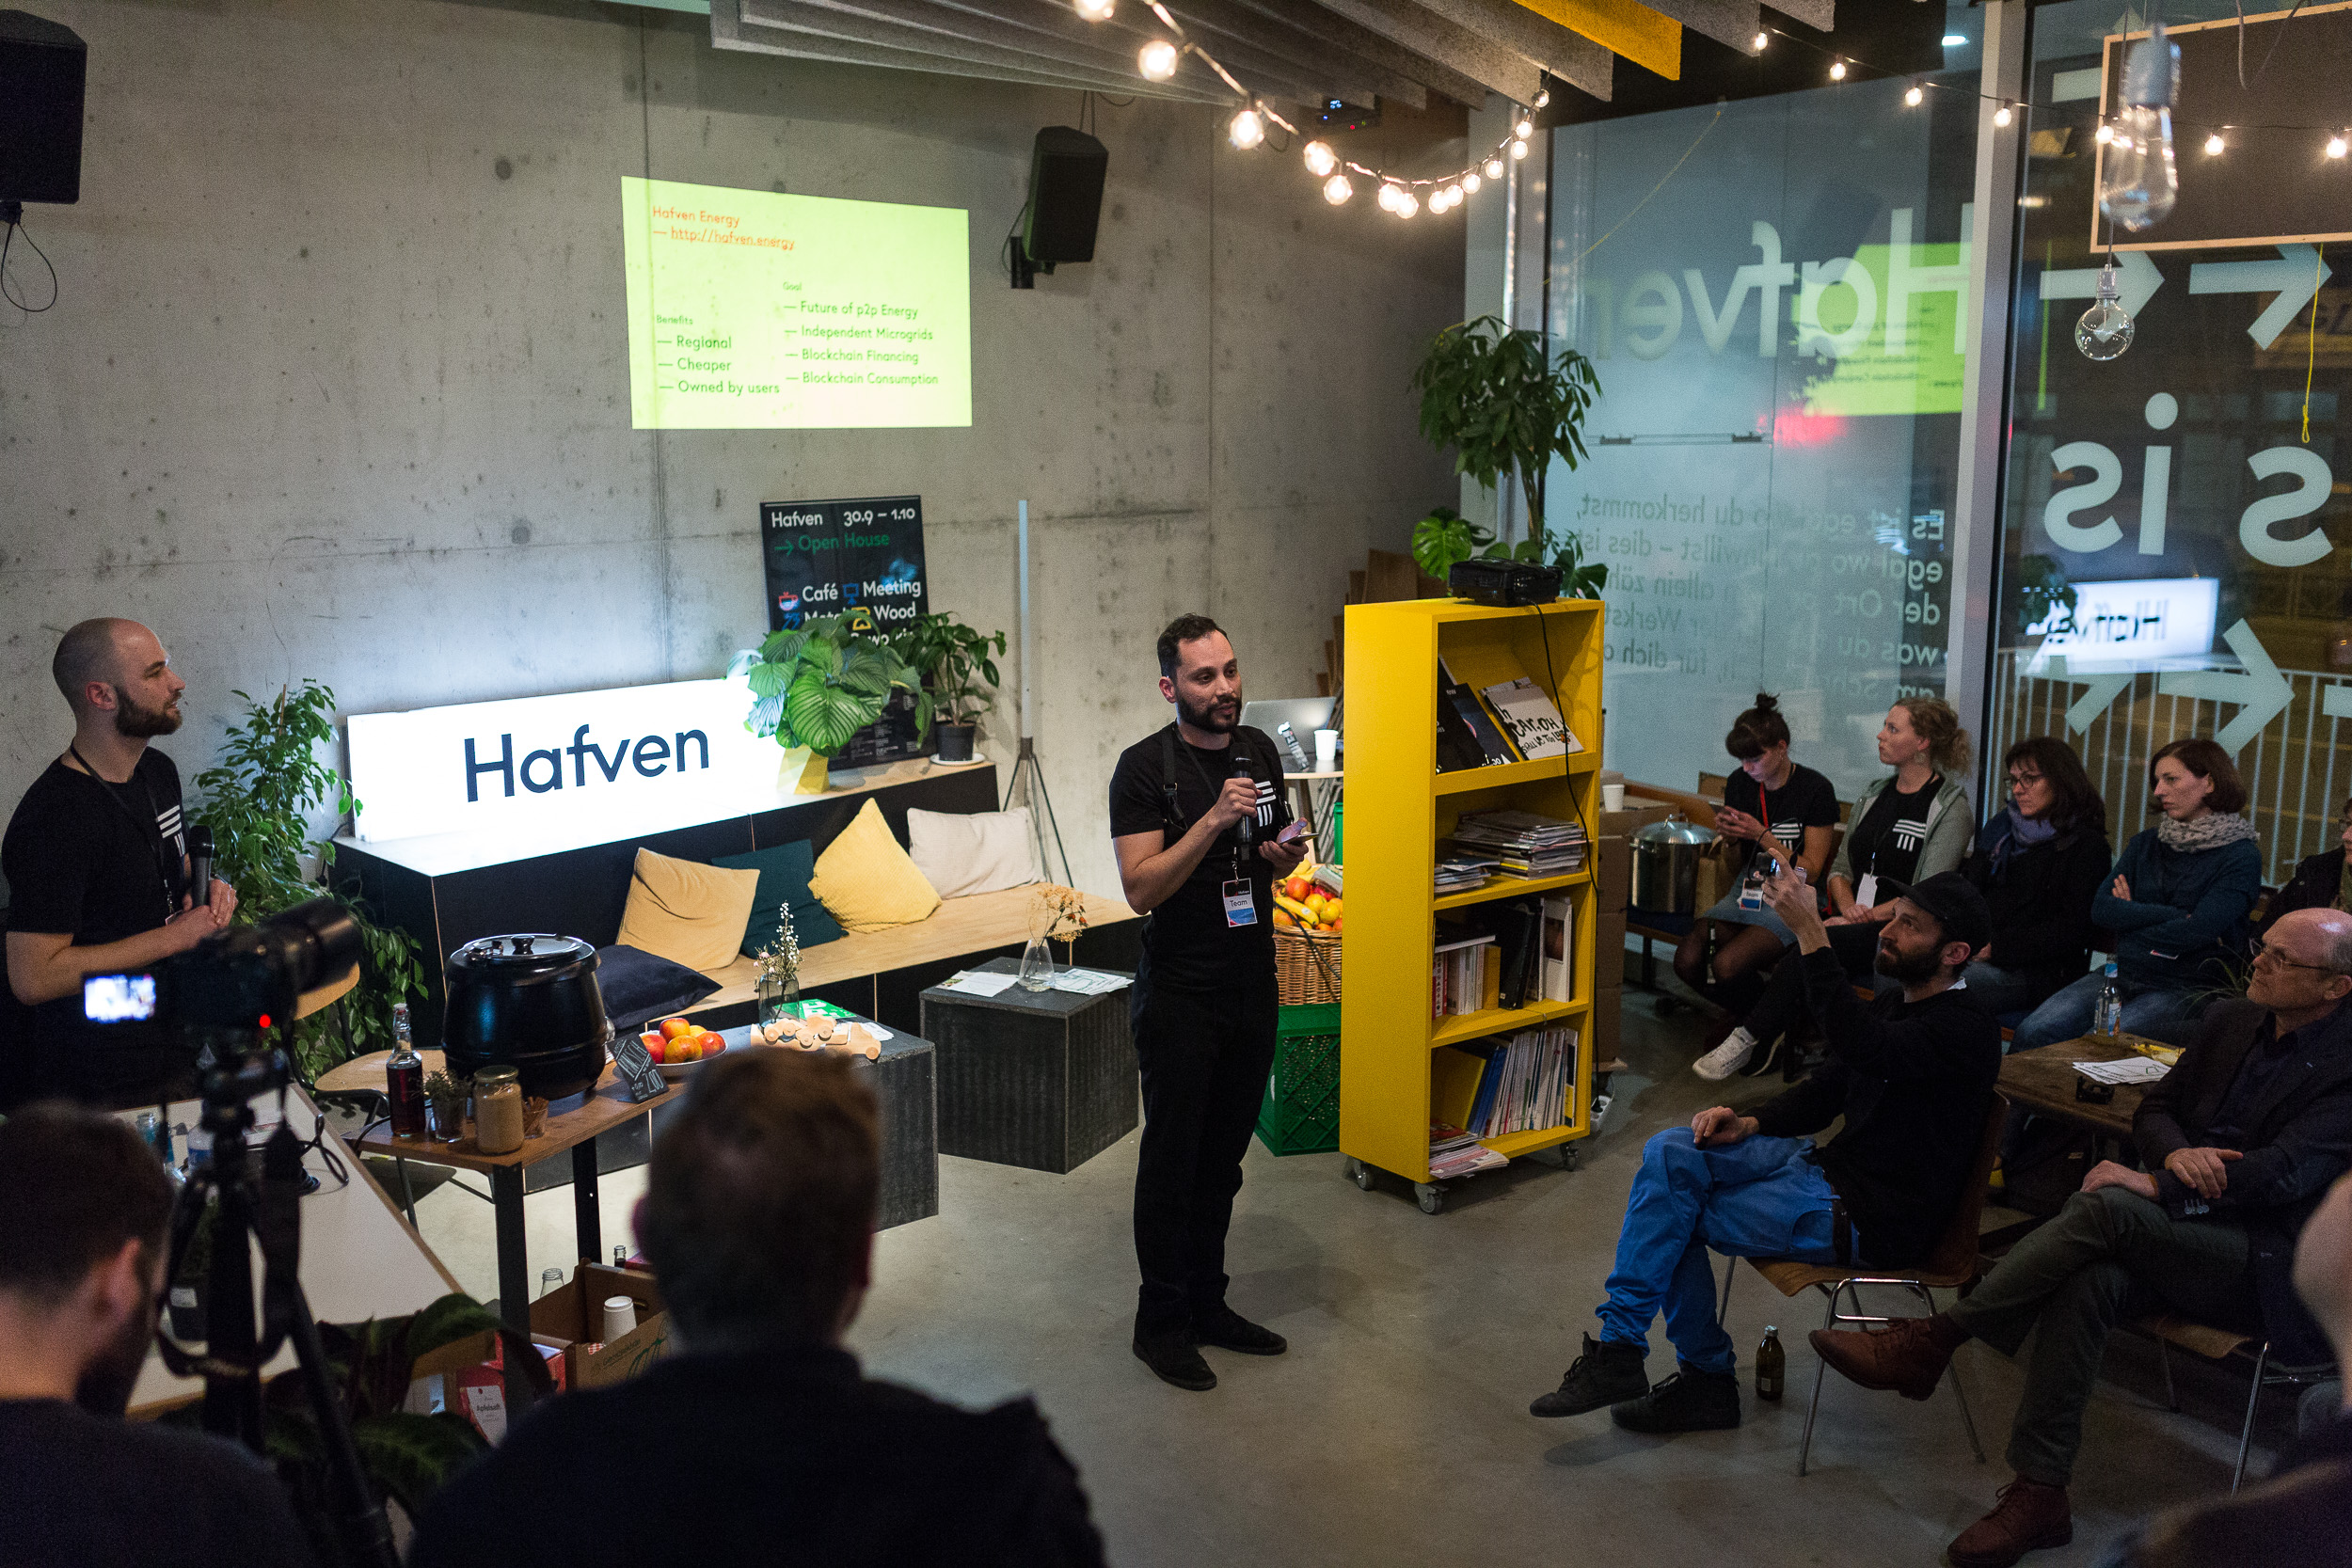 HafvenOpenHouse2.0_LowRes-160.jpg